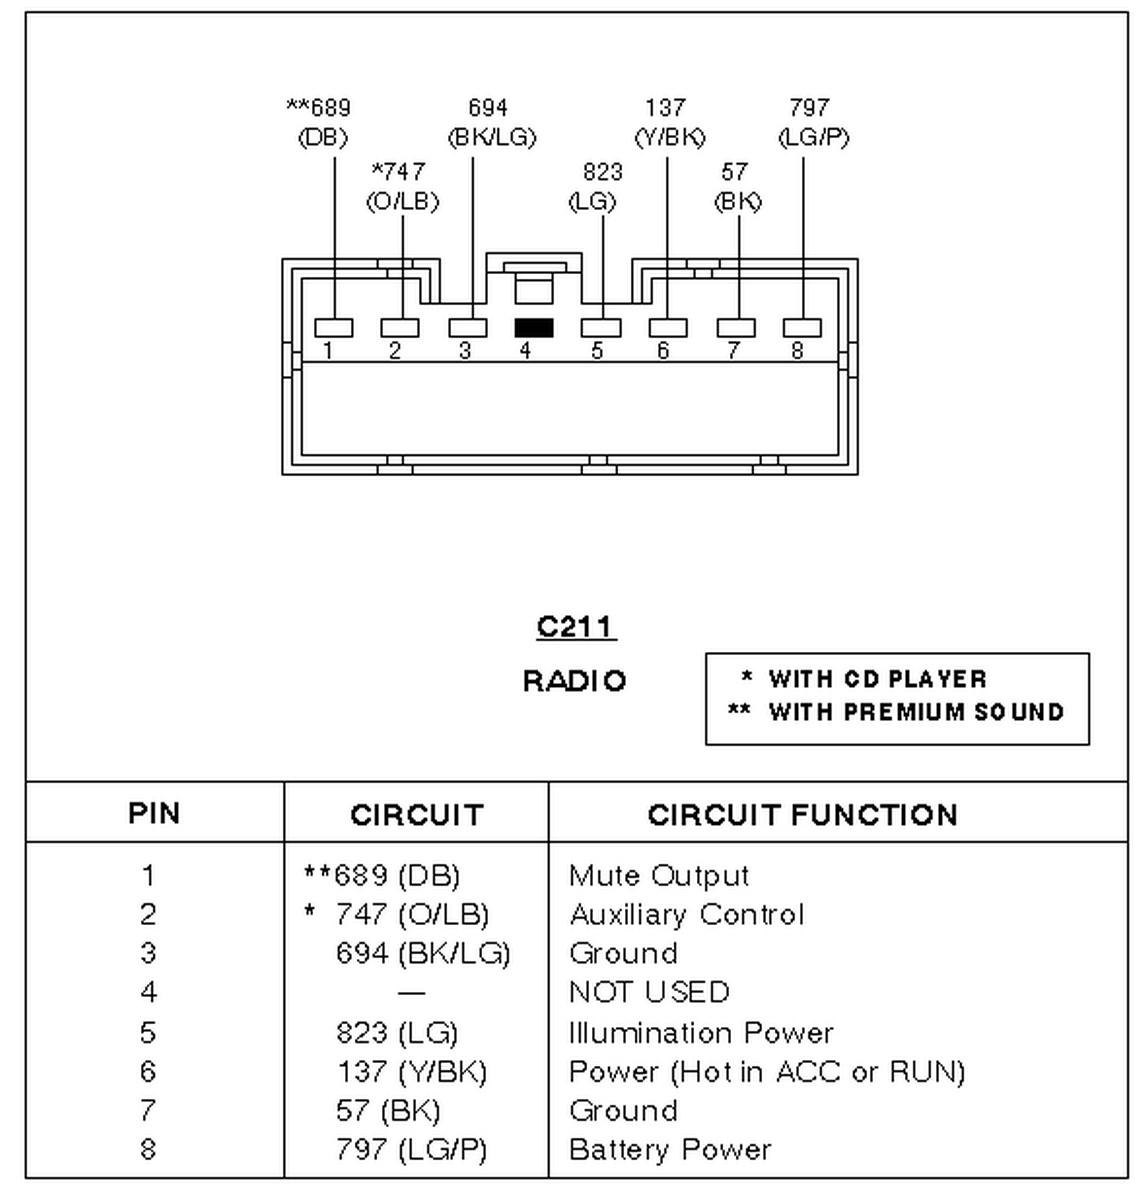 hight resolution of 1996 f150 radio wiring diagram 92 ford explorer radio wiring diagram gooddy org within 1996